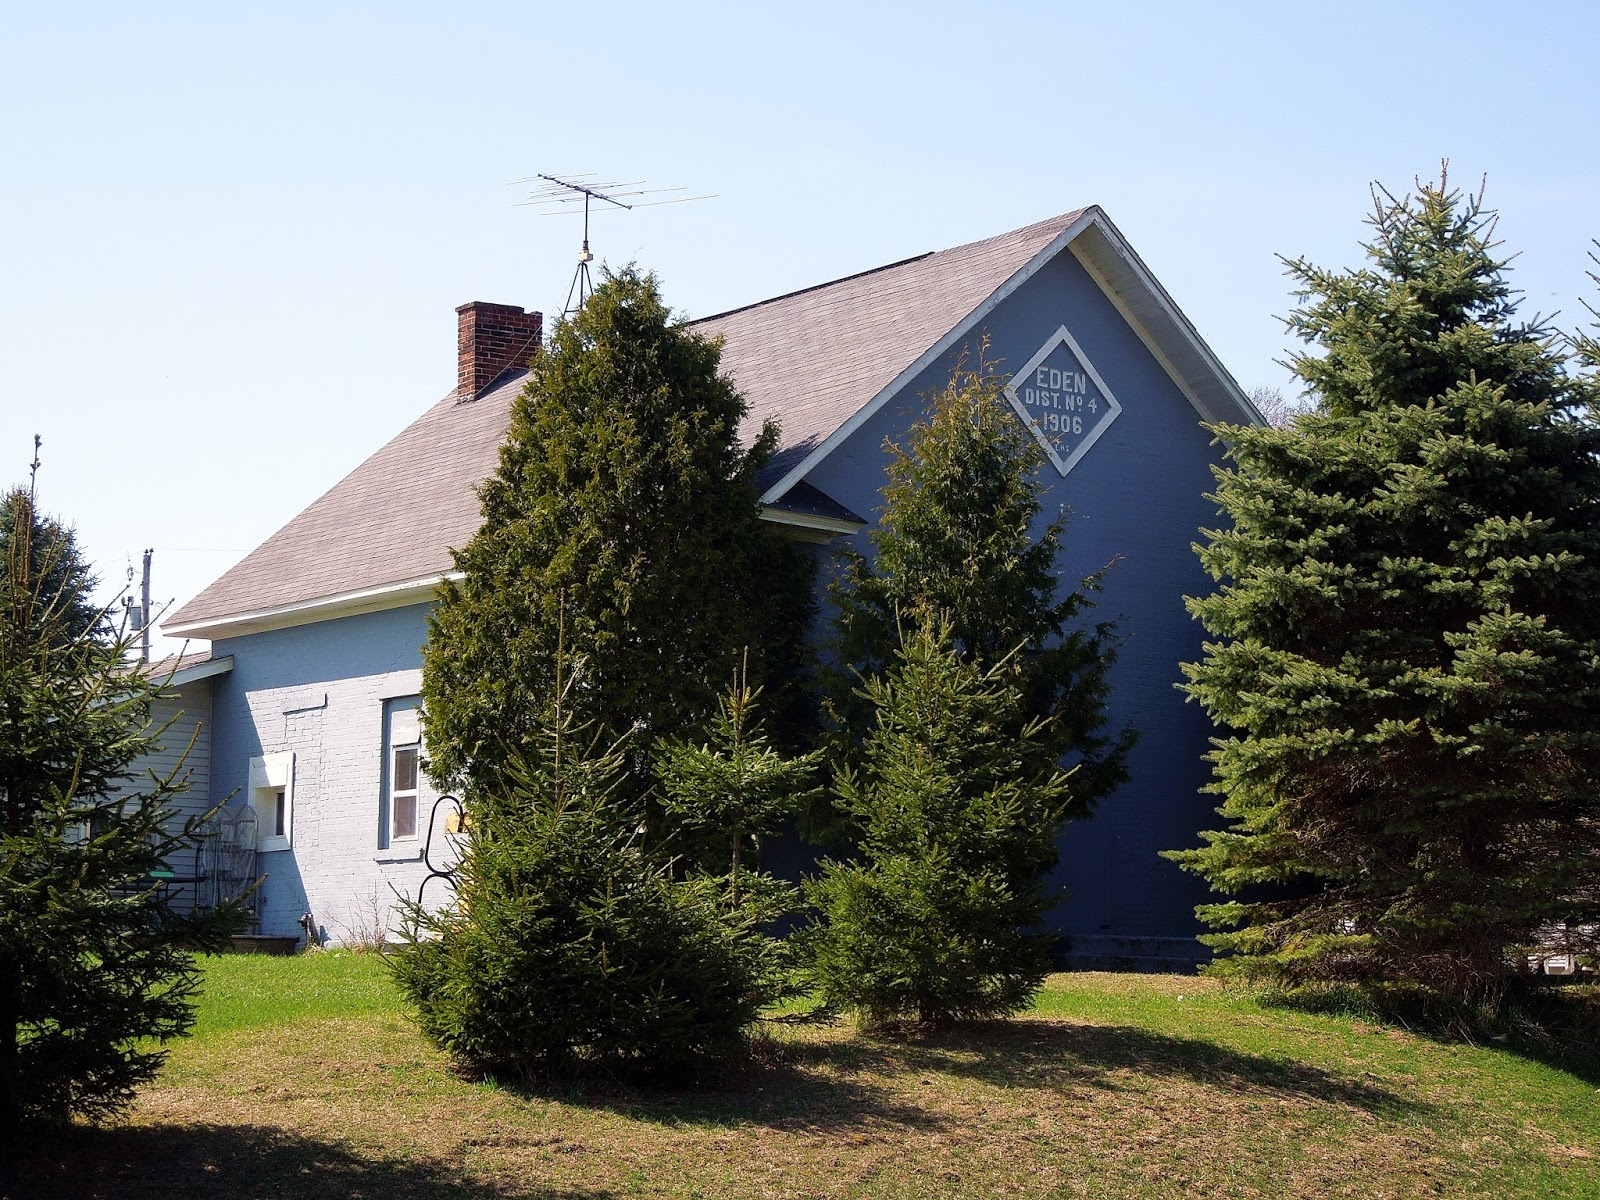 Michigan mason county custer - Location Southwest Corner Of Custer Kinney Roads In Eden Township